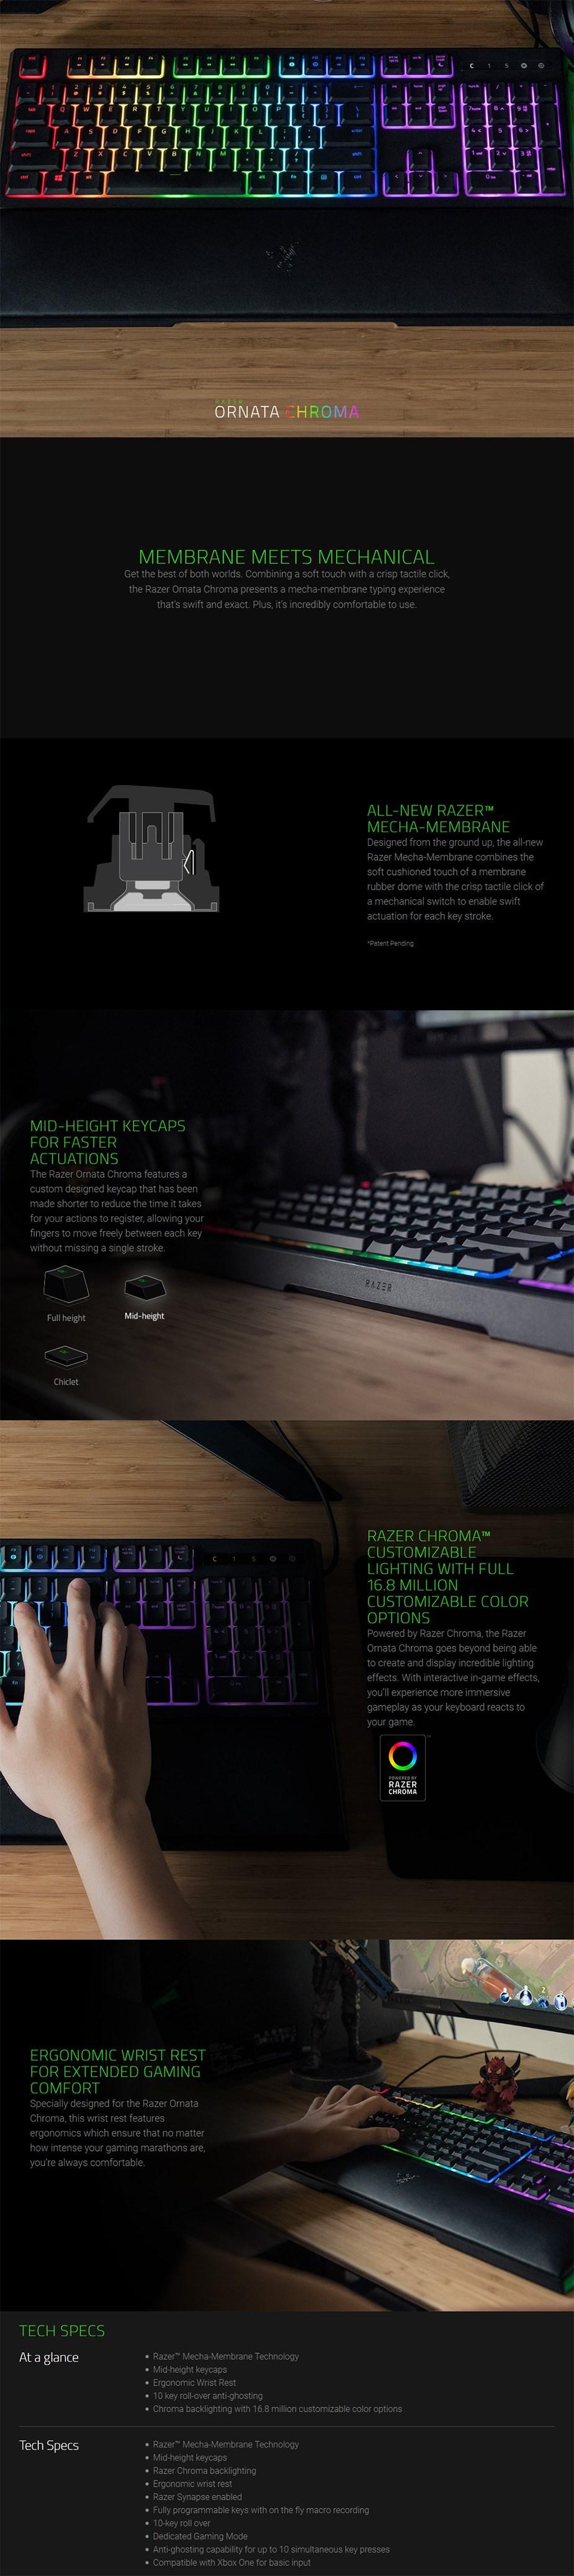 Razer Ornata Chroma Membrane Mechanical Gaming Keyboard - Overview 1